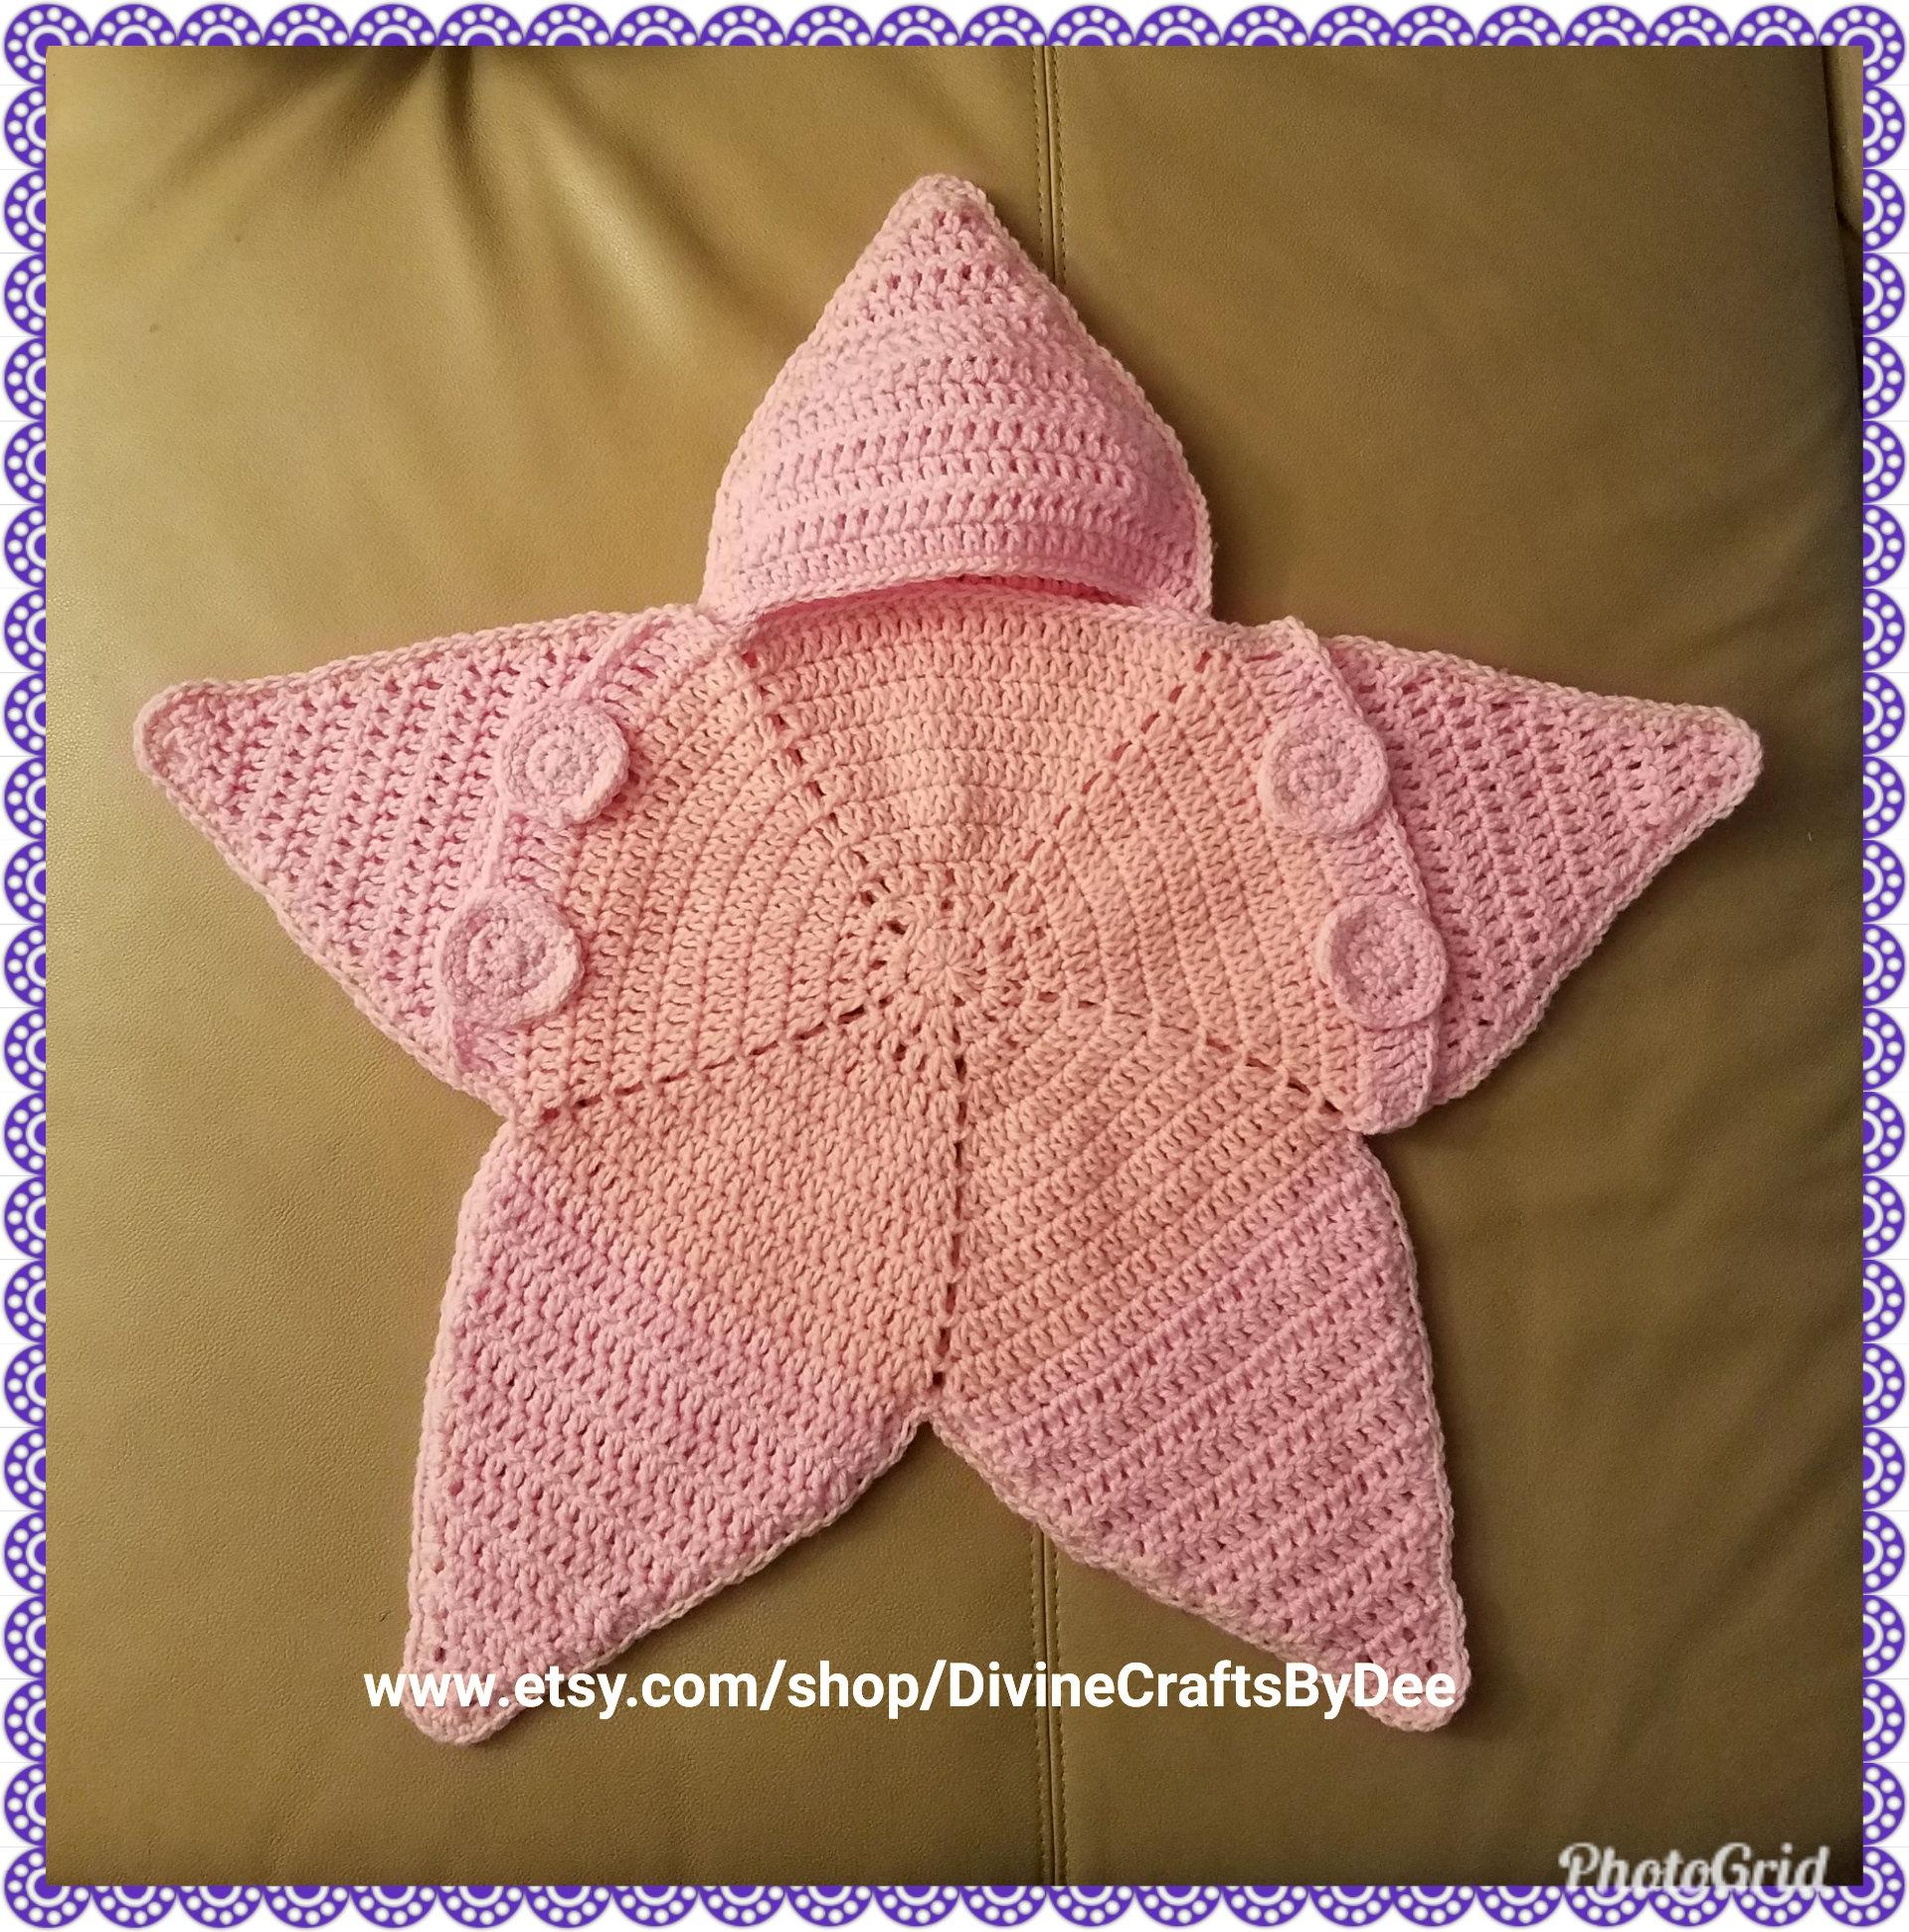 Crochet Newborn Baby Star Bunting Cocoon Etsy